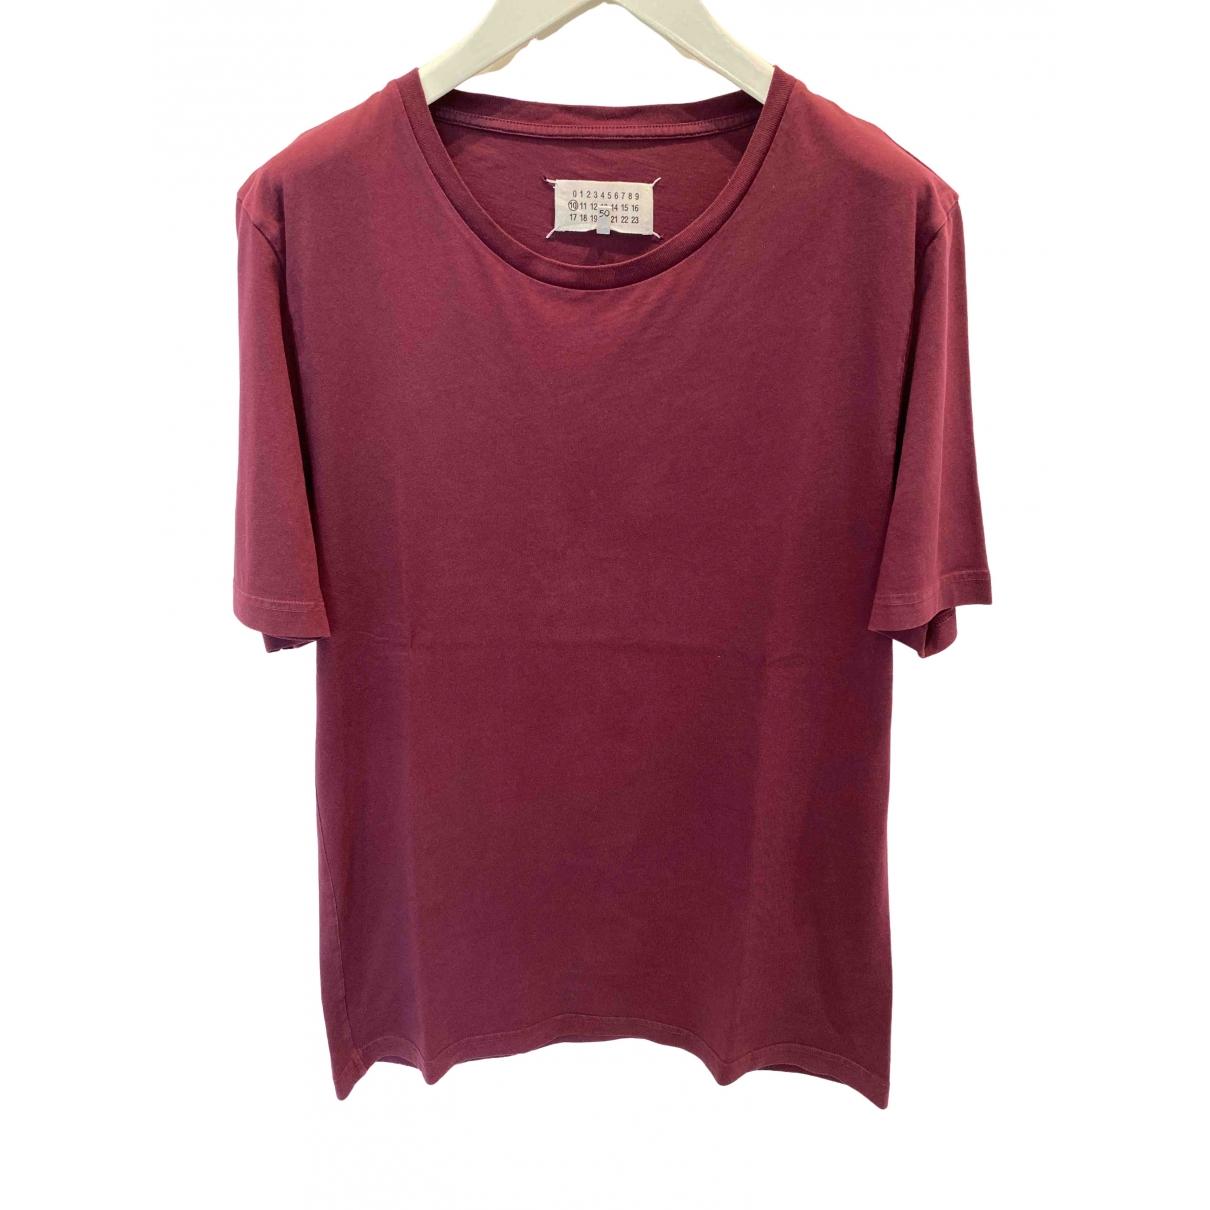 Maison Martin Margiela \N Burgundy Cotton T-shirts for Men L International